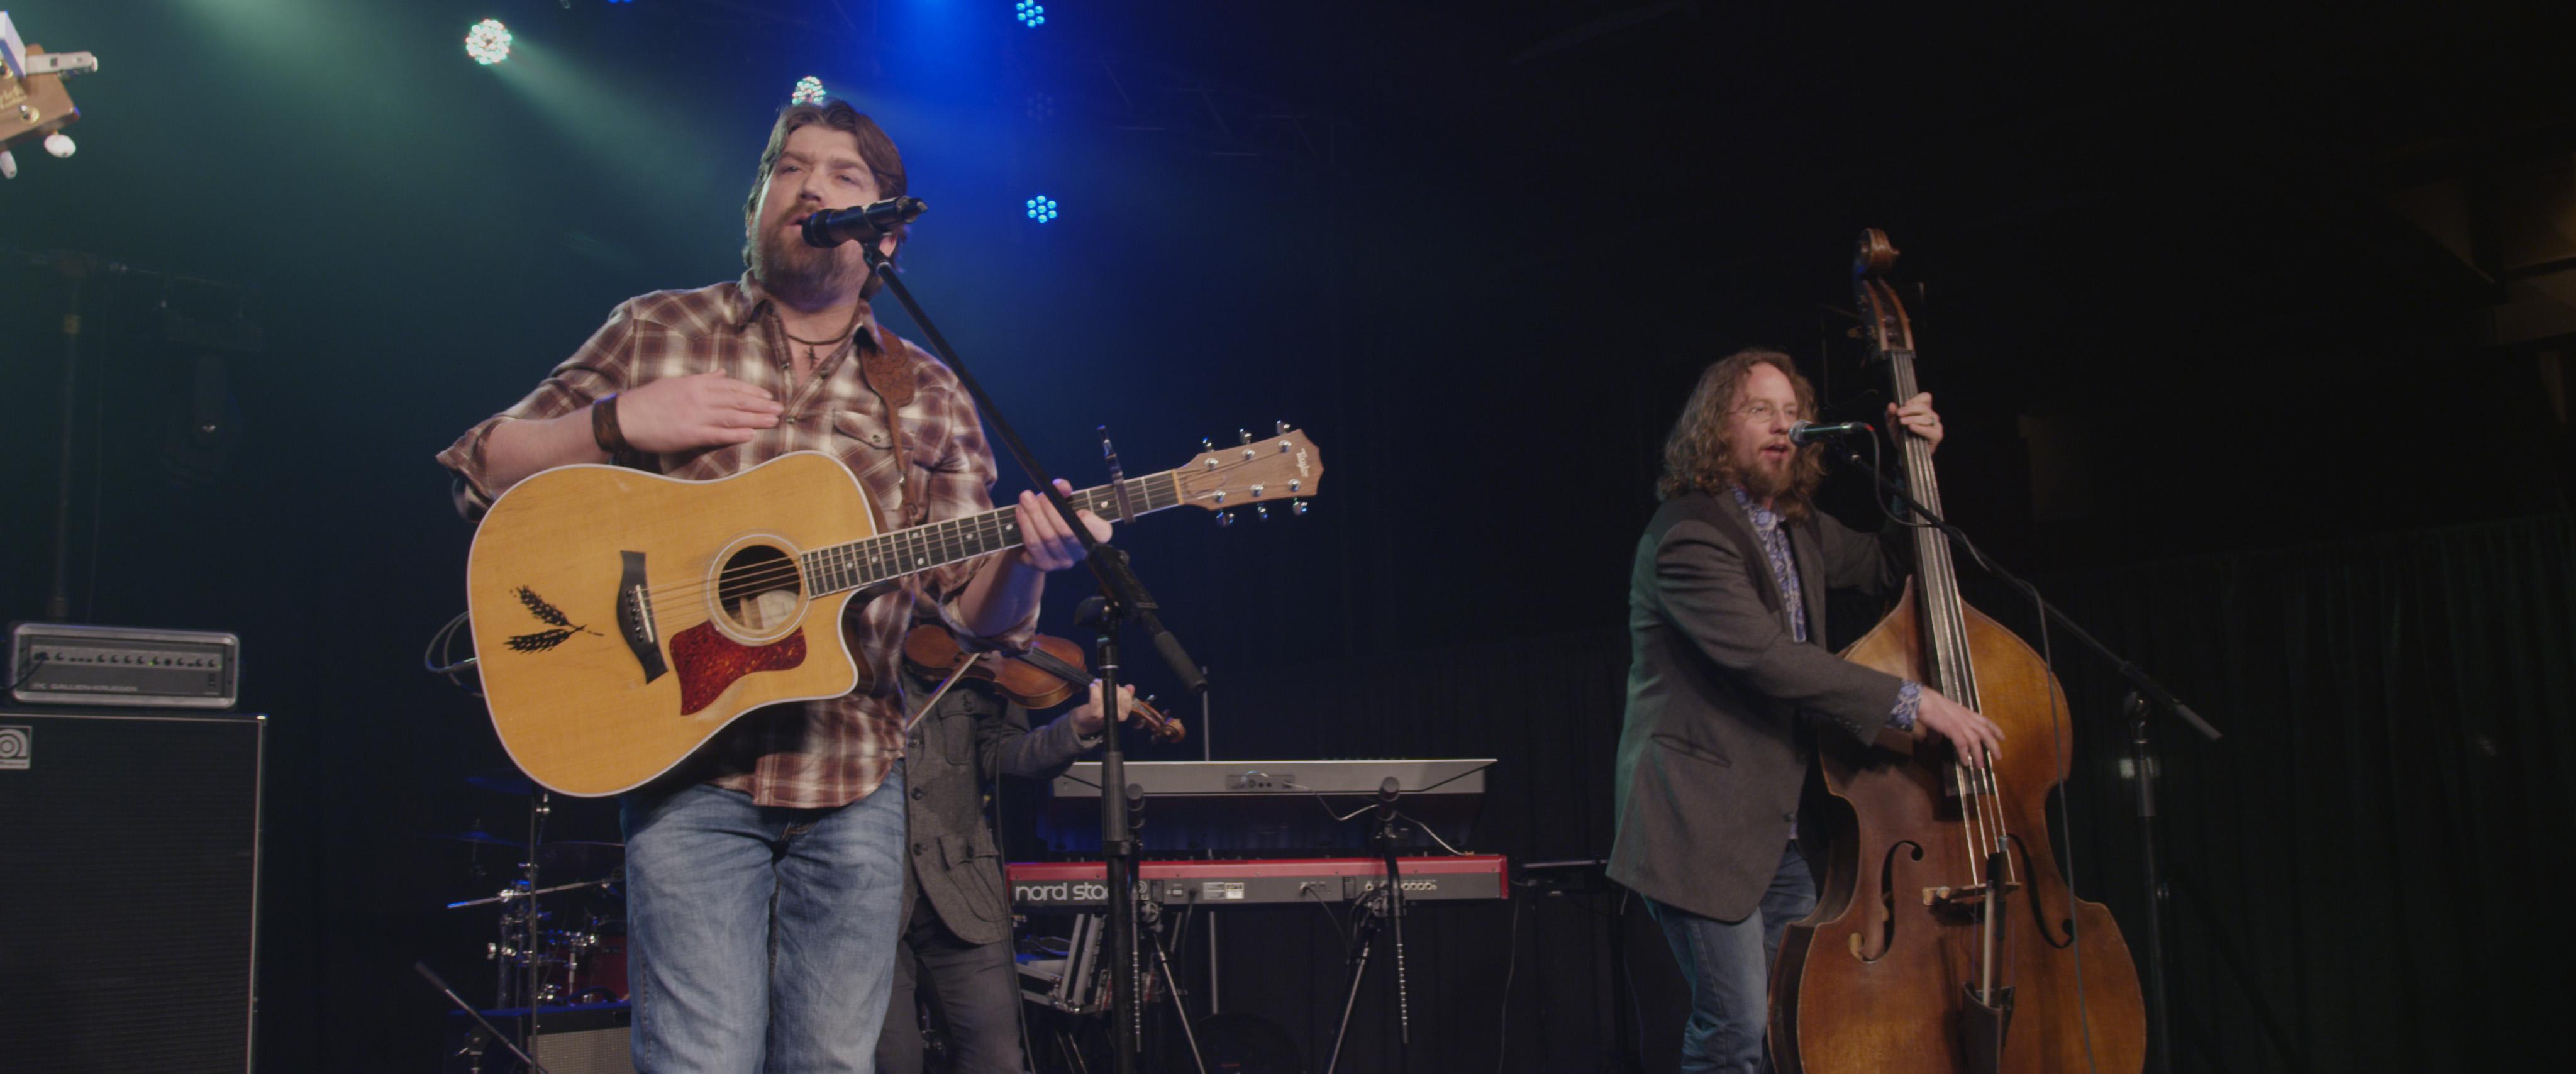 Blake Reid Band - 2017 ACMA's 09